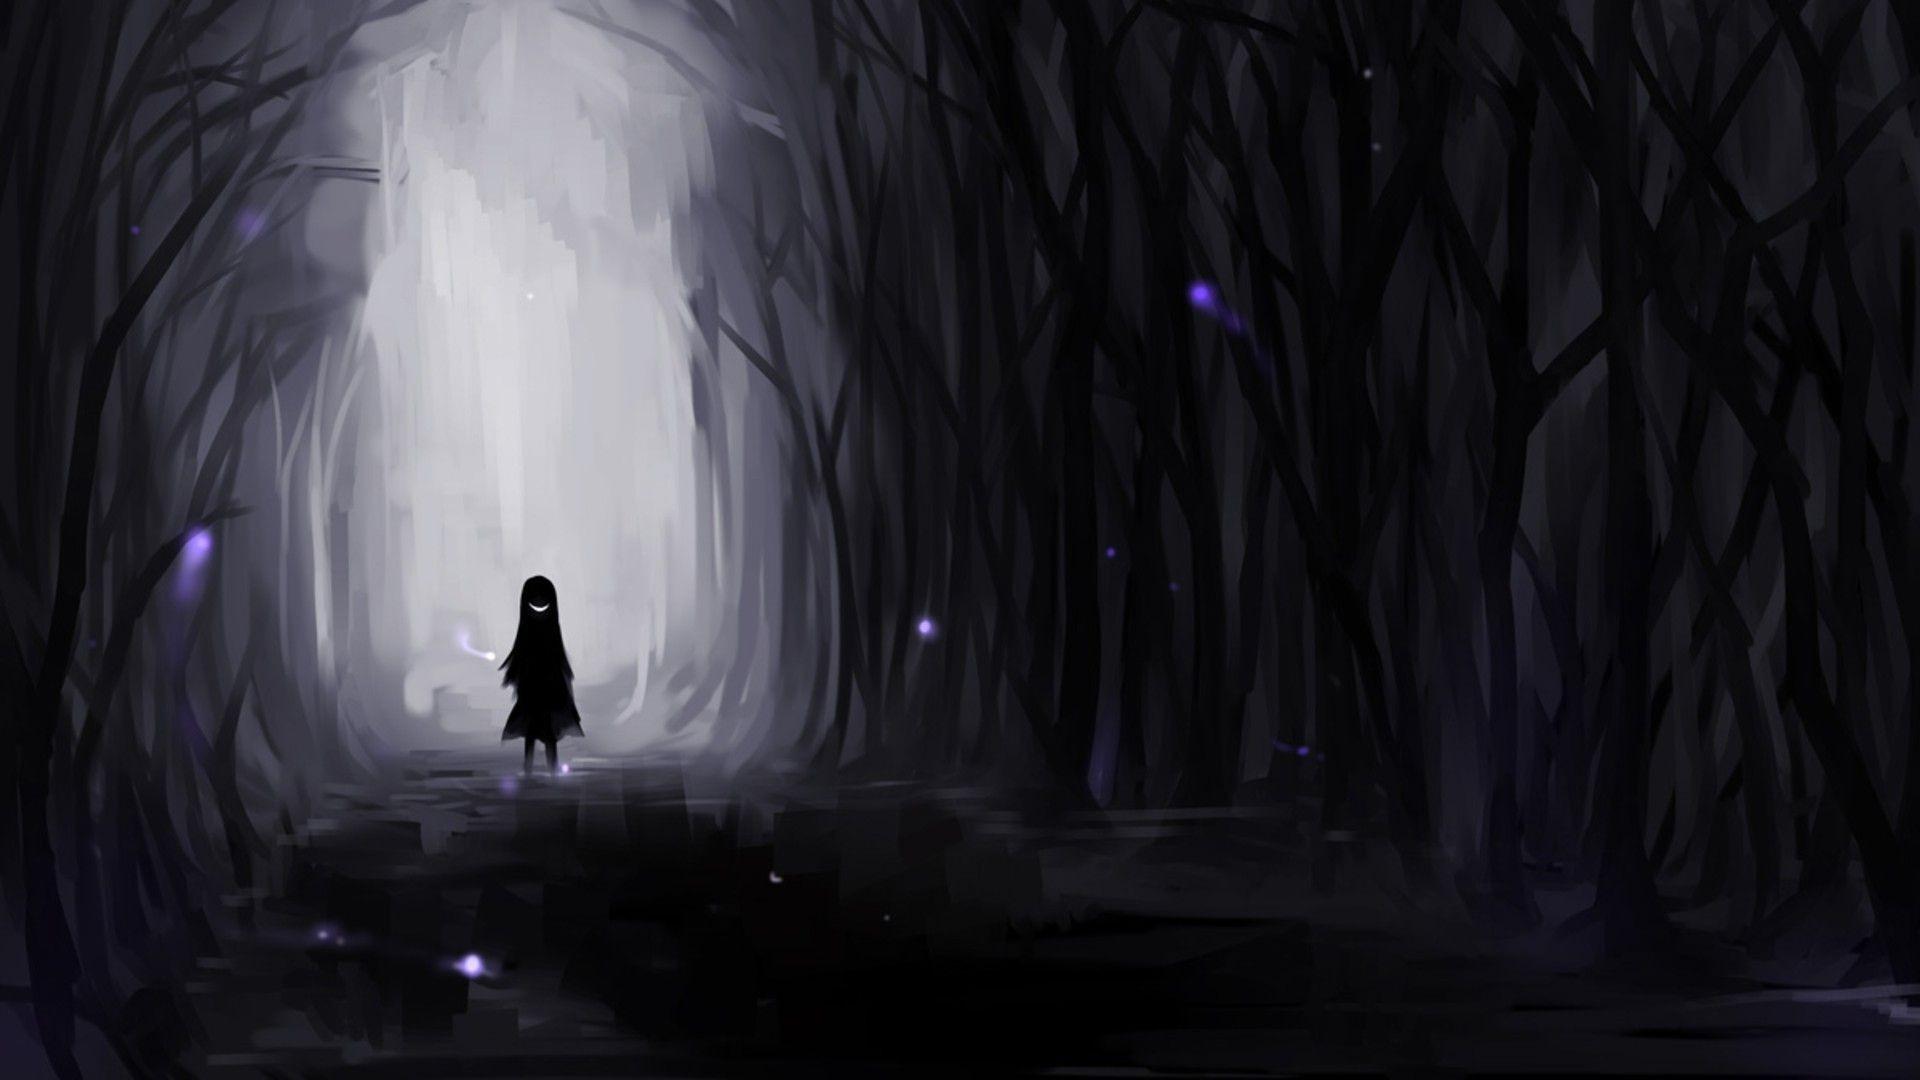 Dark Anime Wallpaper Hd 66 Images